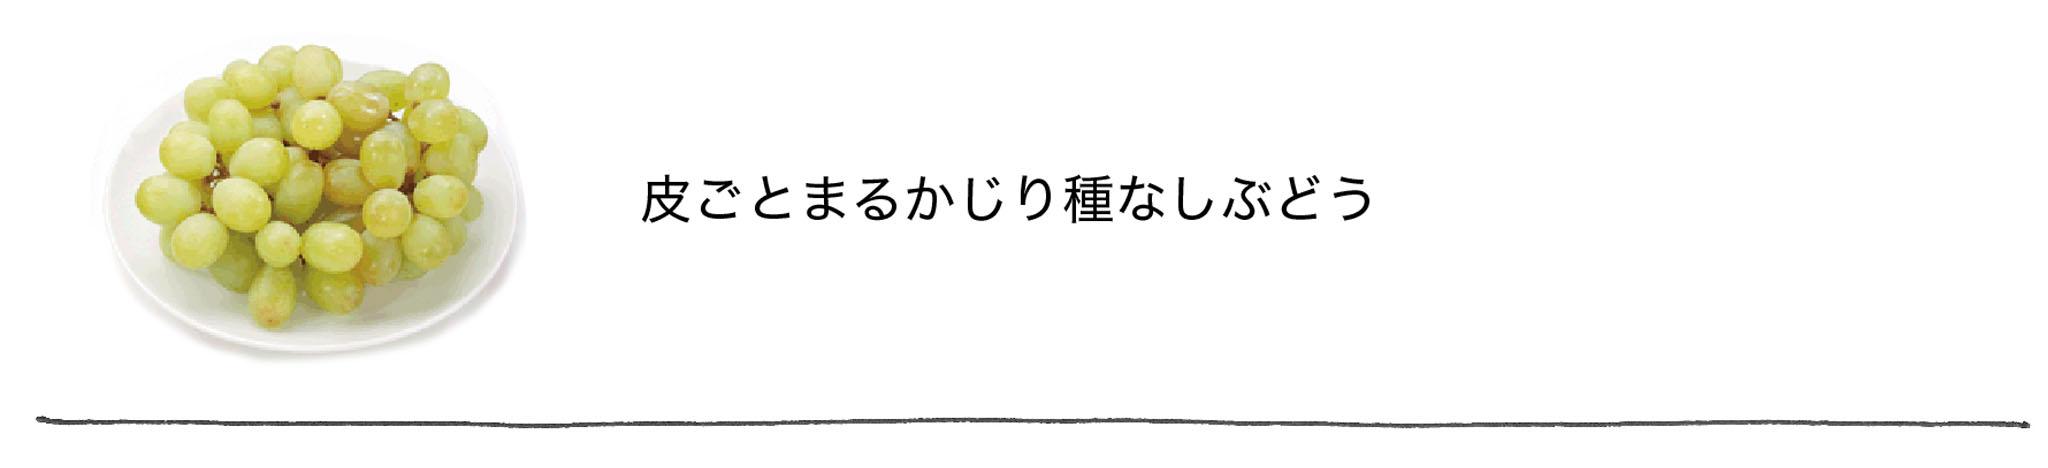 natuoyasu_h.jpg